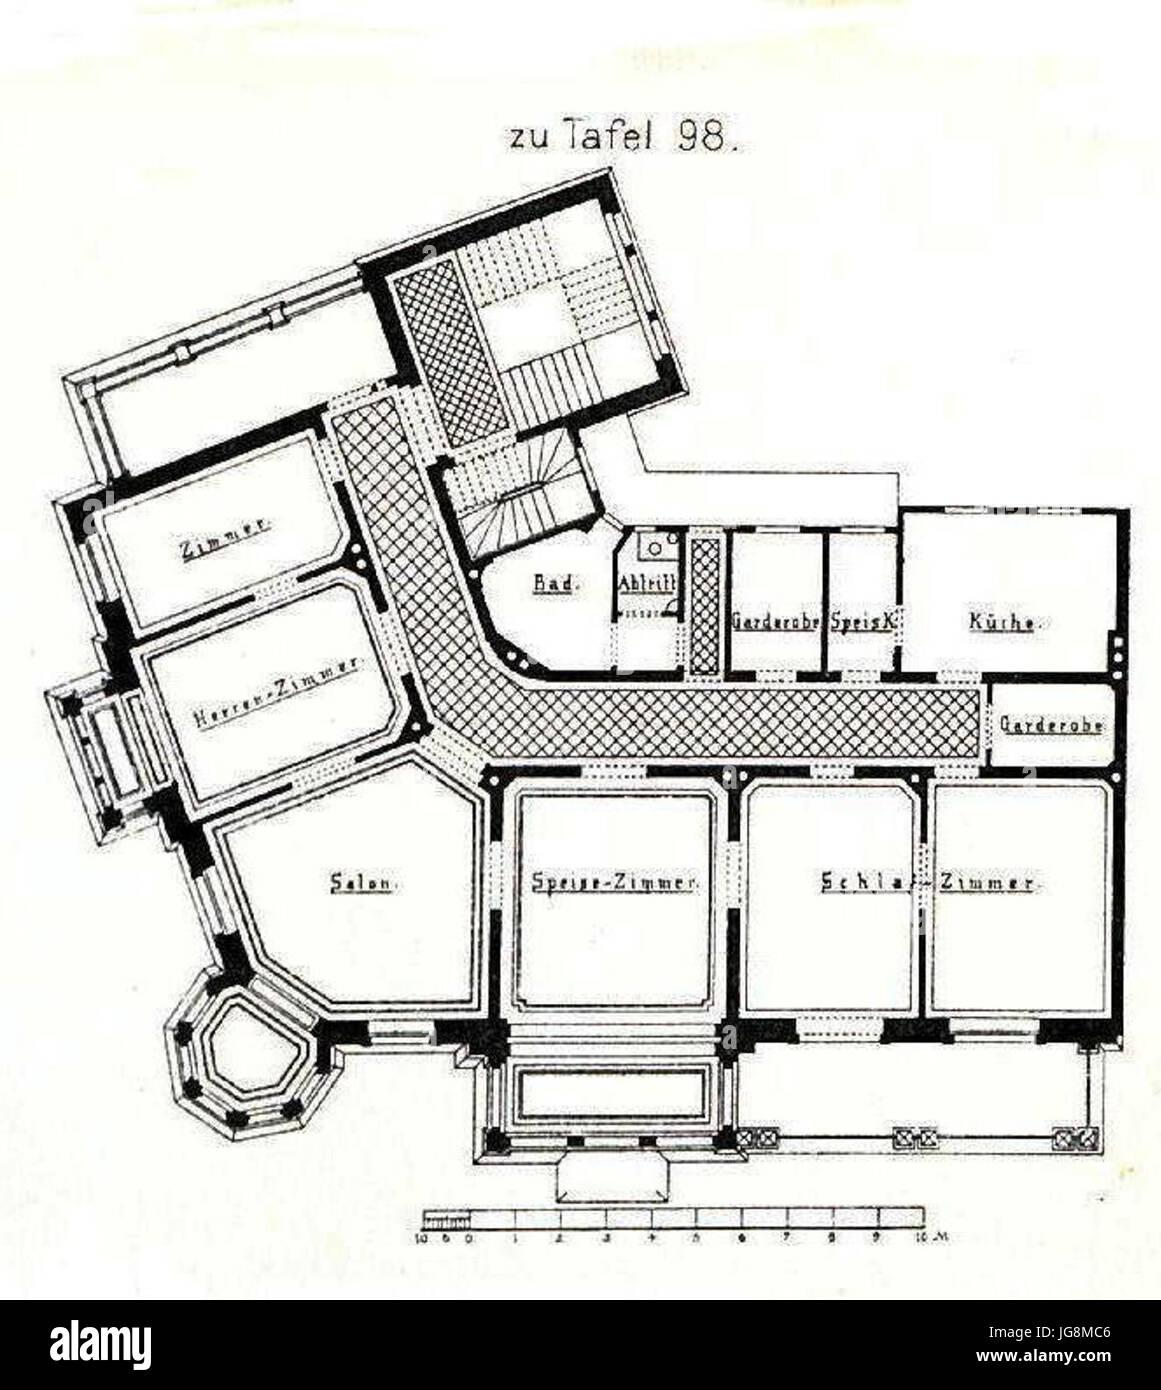 Villa Kaiserstrasse 71 Mainz Architekt G Peisker Aus Grundriss Tafel 98 Kick Jahrgang I